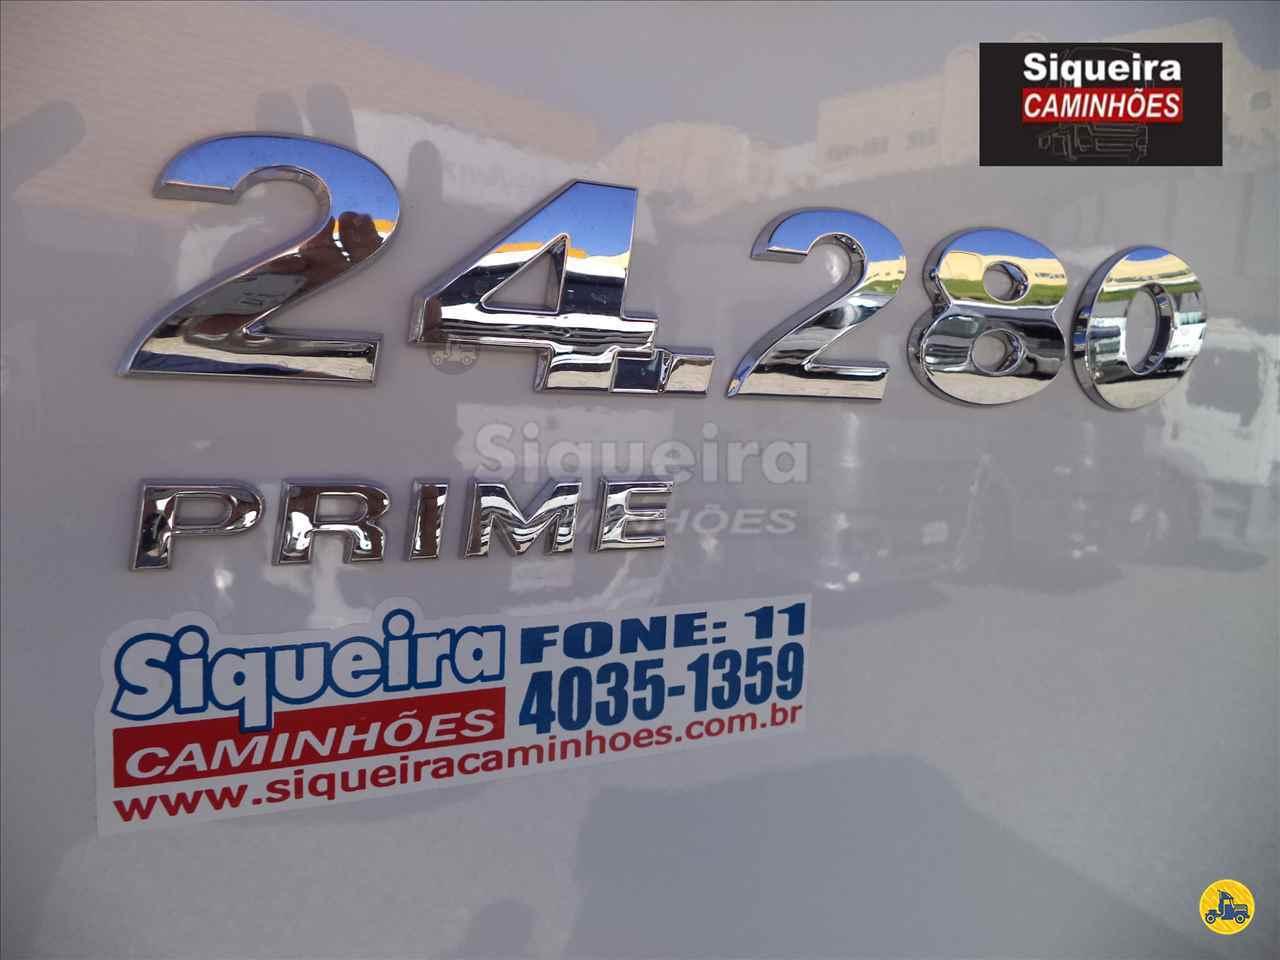 VOLKSWAGEN VW 24280 576km 2021/2022 Siqueira Caminhões